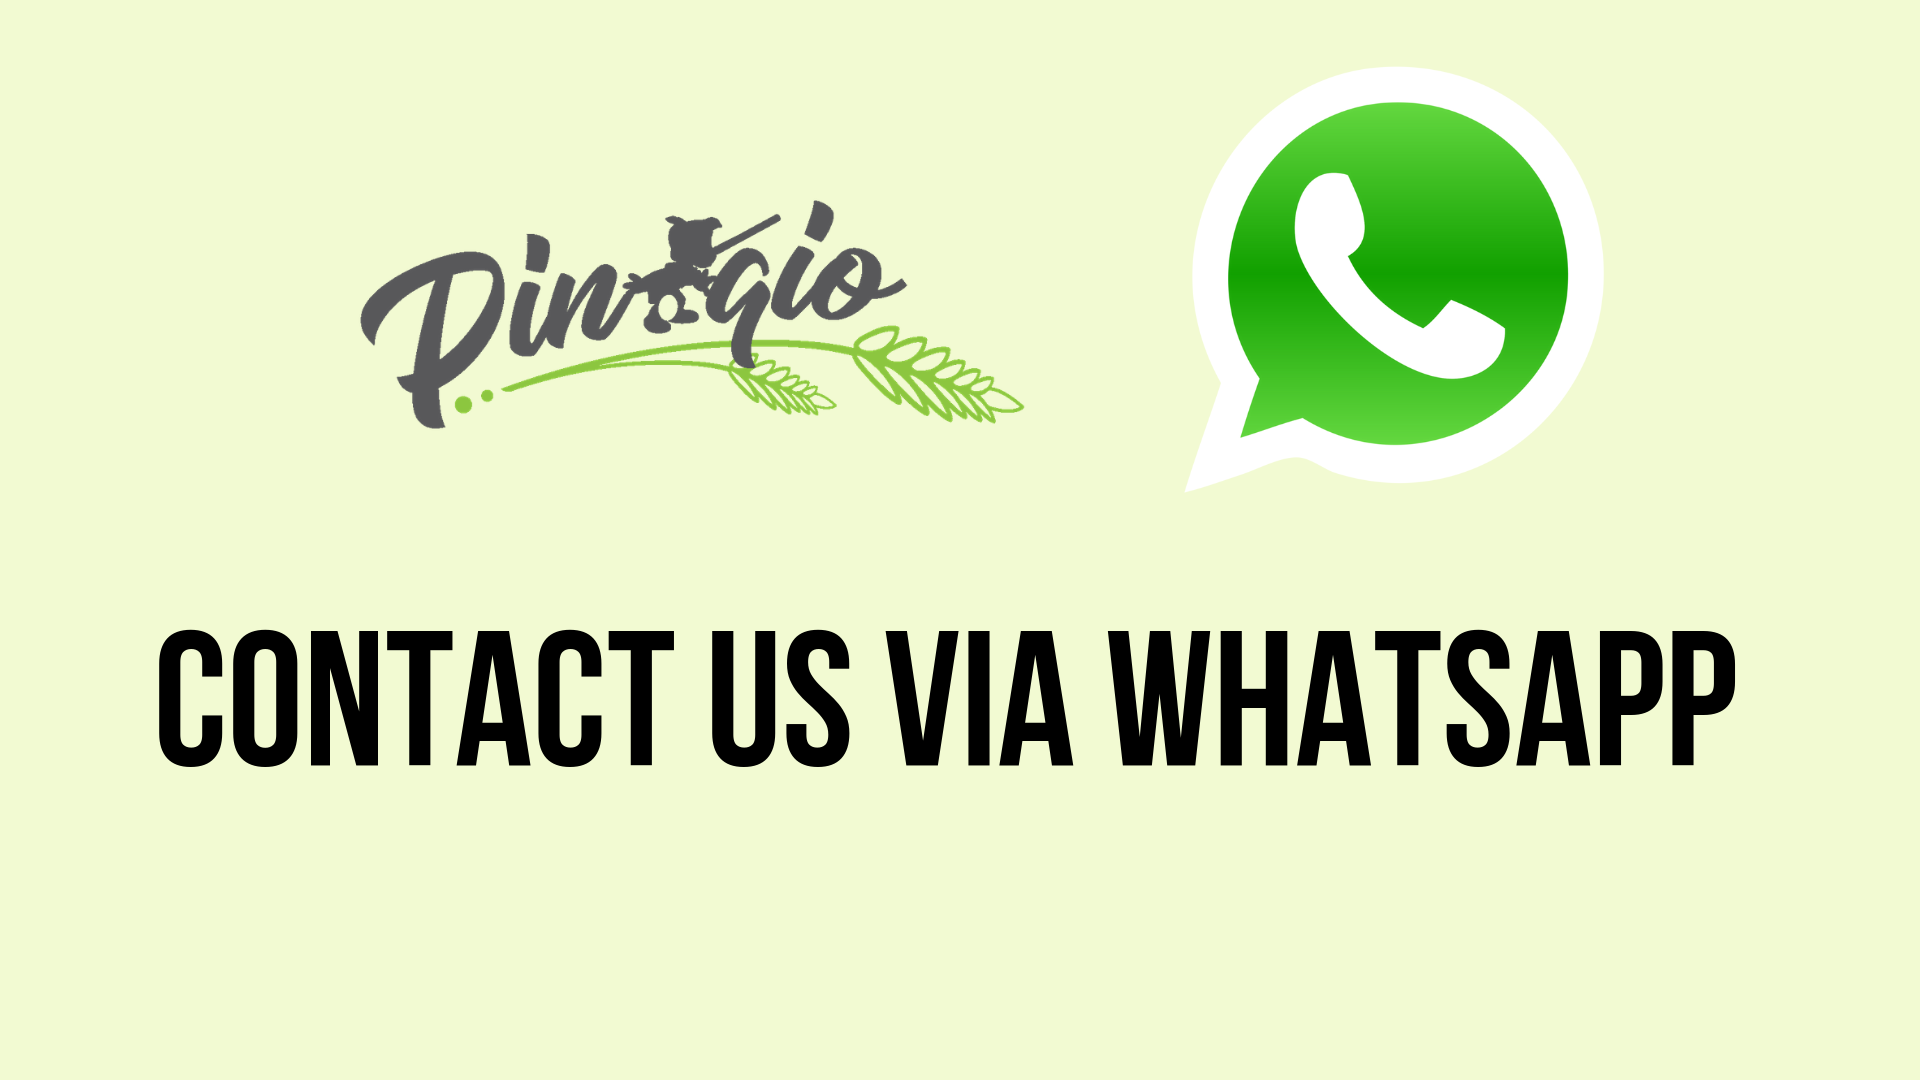 Whatsapp Pinnoqio